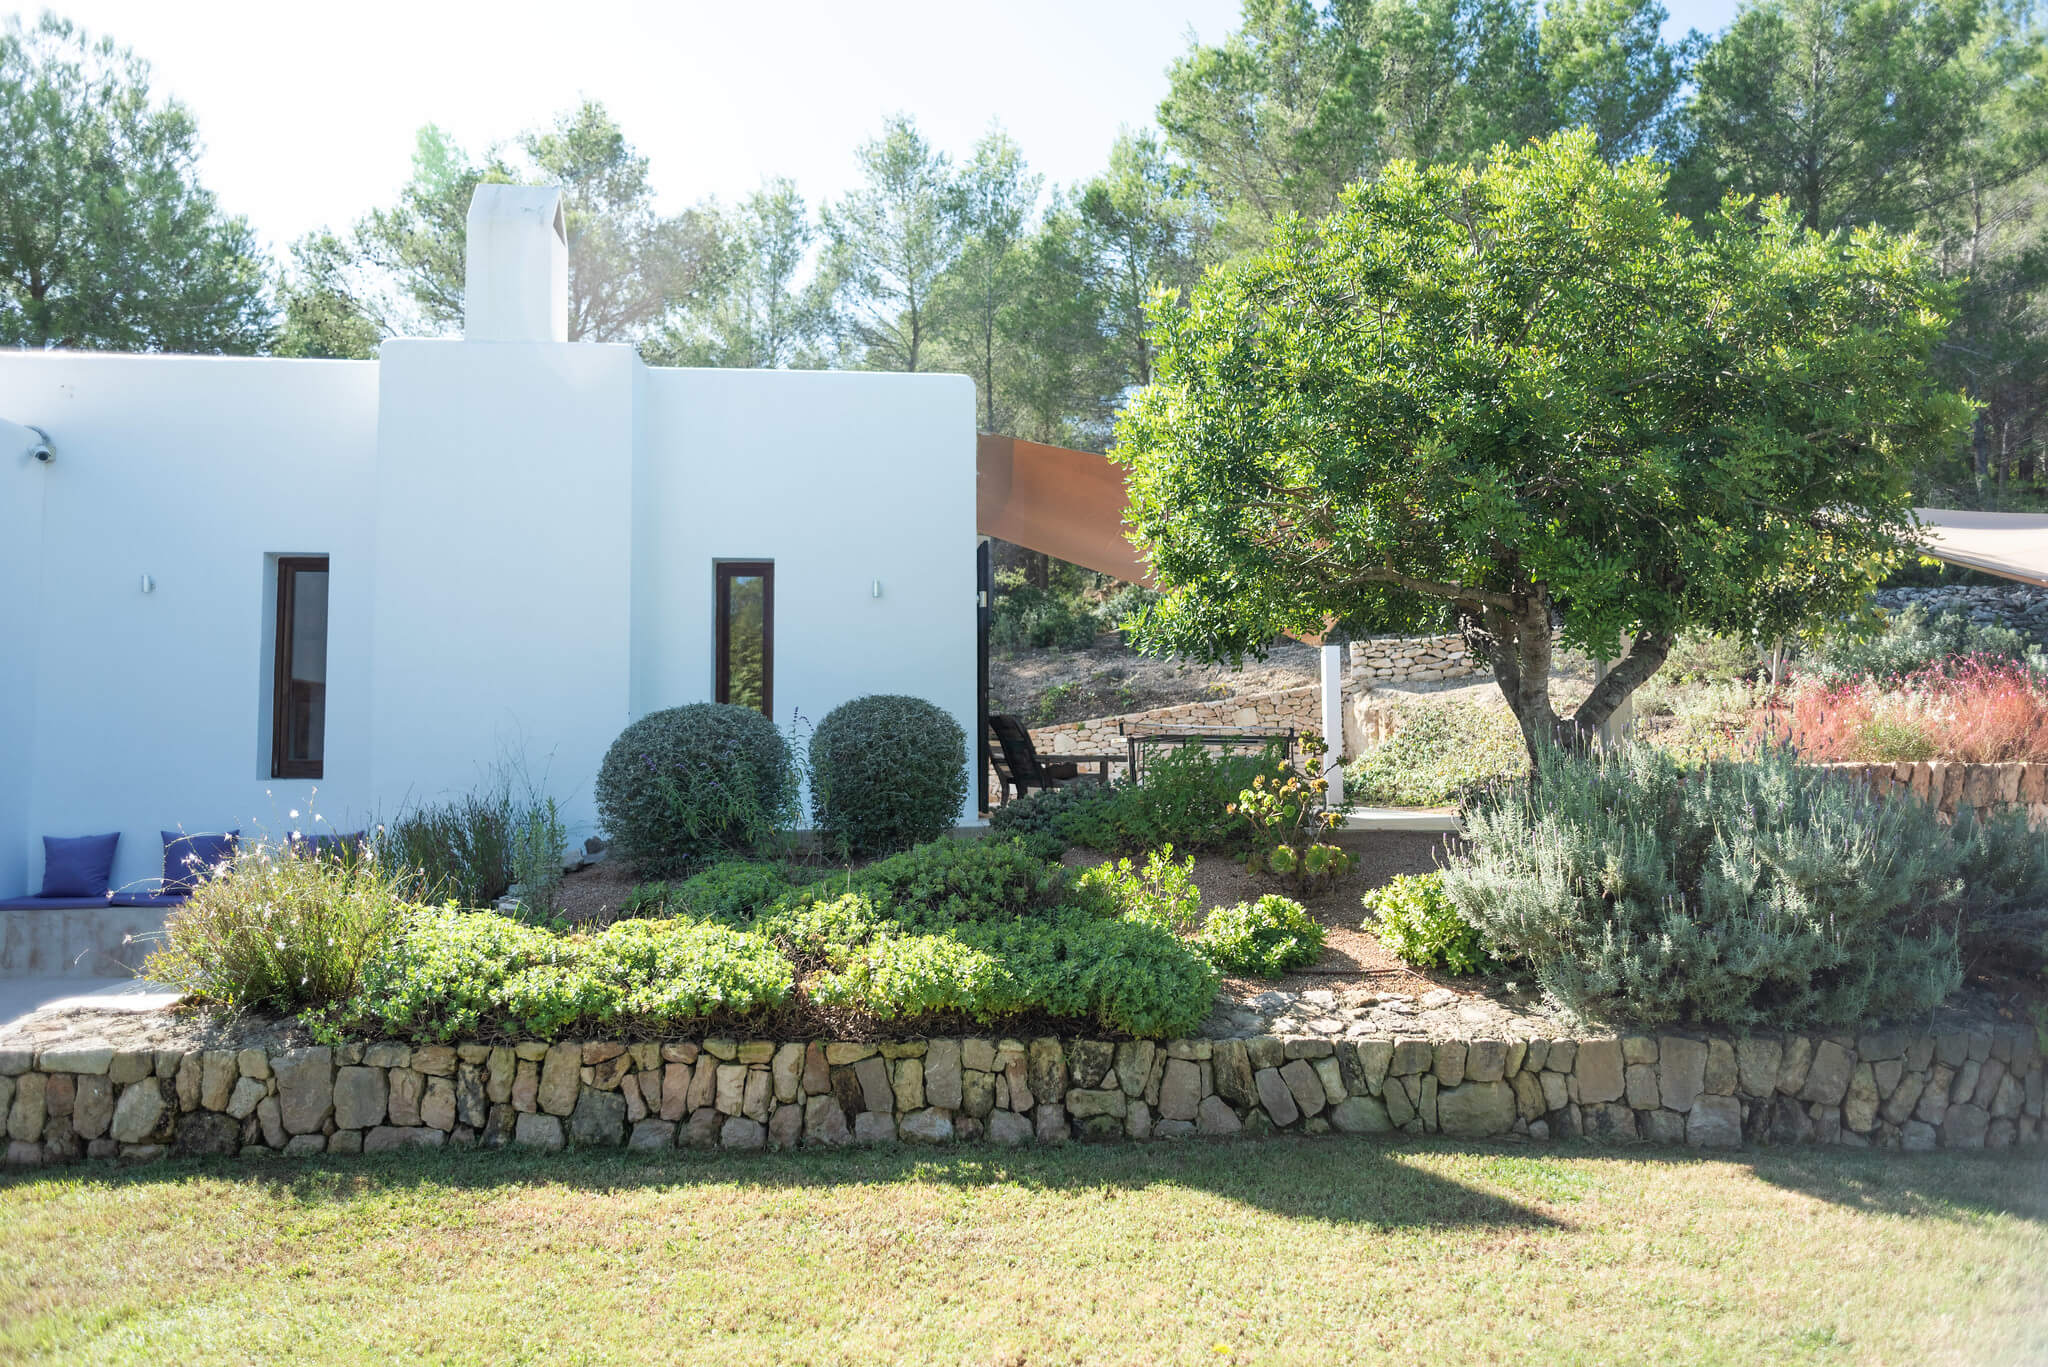 https://www.white-ibiza.com/wp-content/uploads/2020/06/white-ibiza-villas-casa-arabella-exterior-garden2.jpg